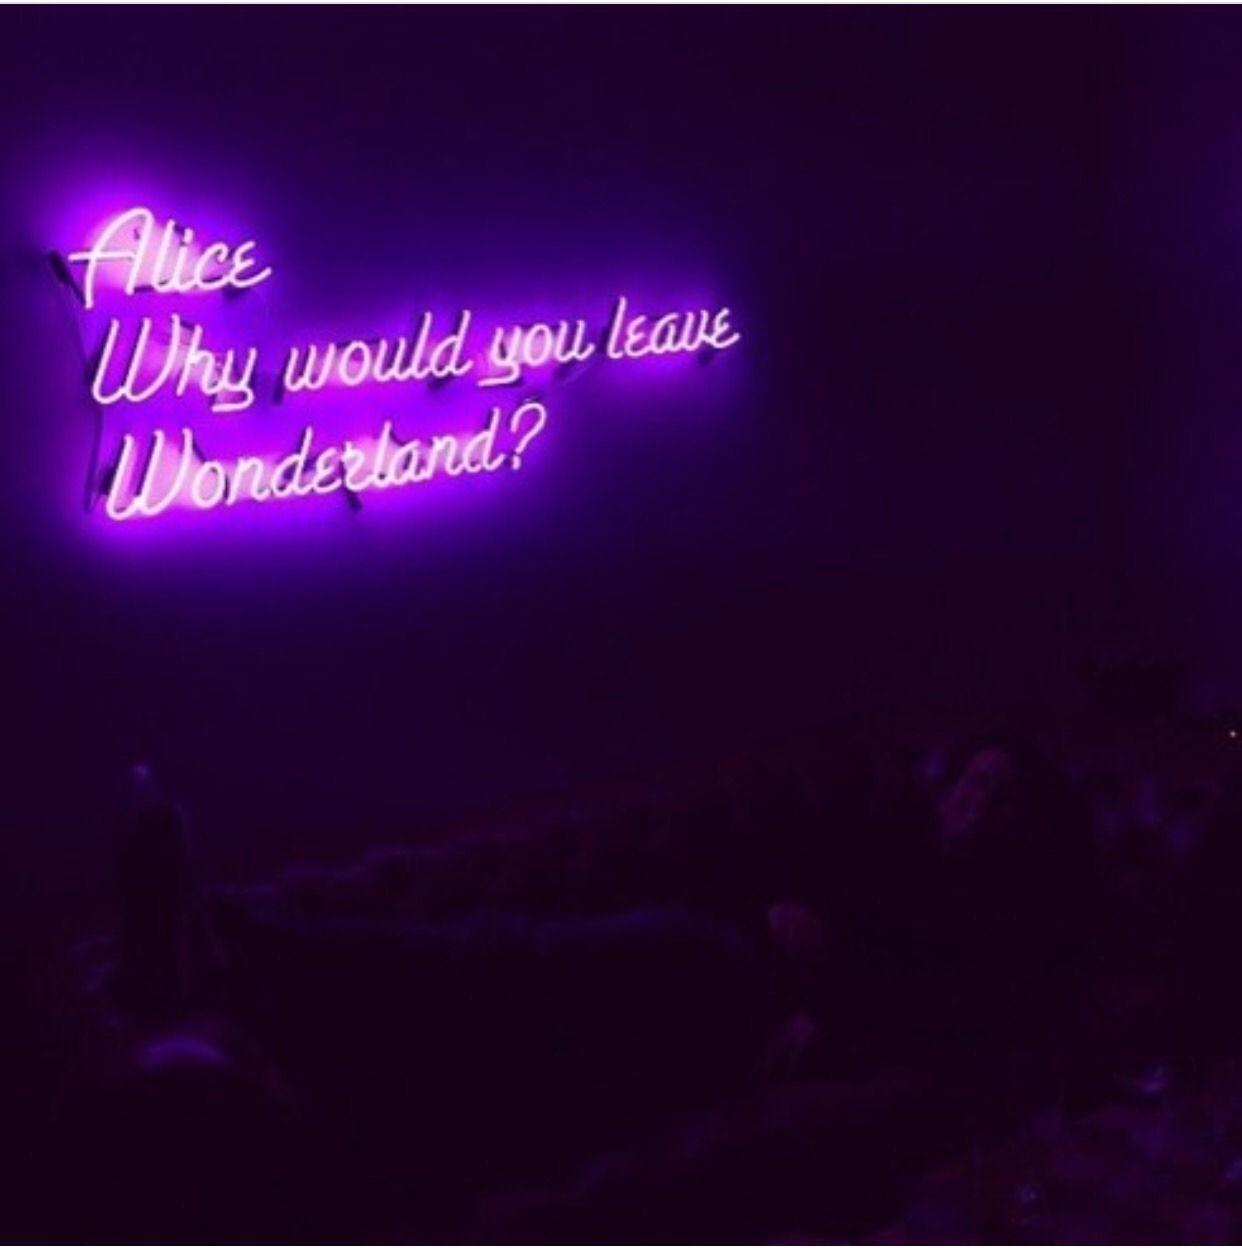 Light Quotes Cris Figueiredo  Quotes  Pinterest  Neon Depressing And